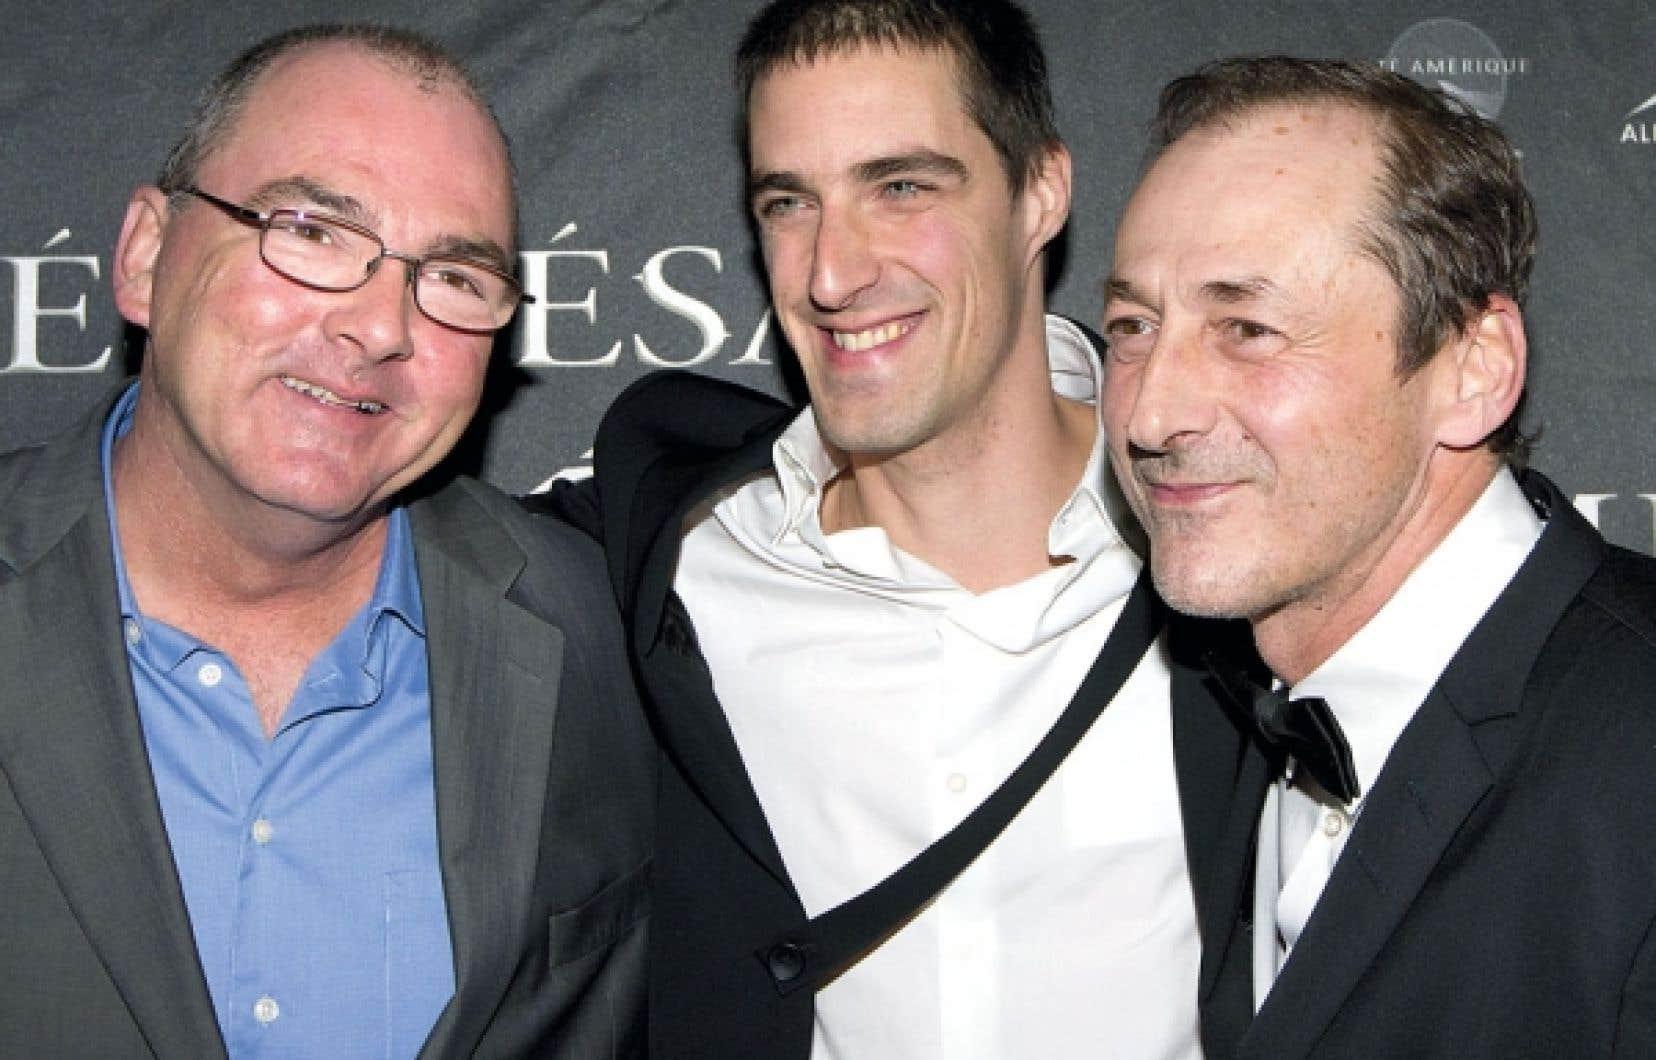 Luc Picard en compagnie des comédiens Nicola-Frank Vachon et Gildor Roy.